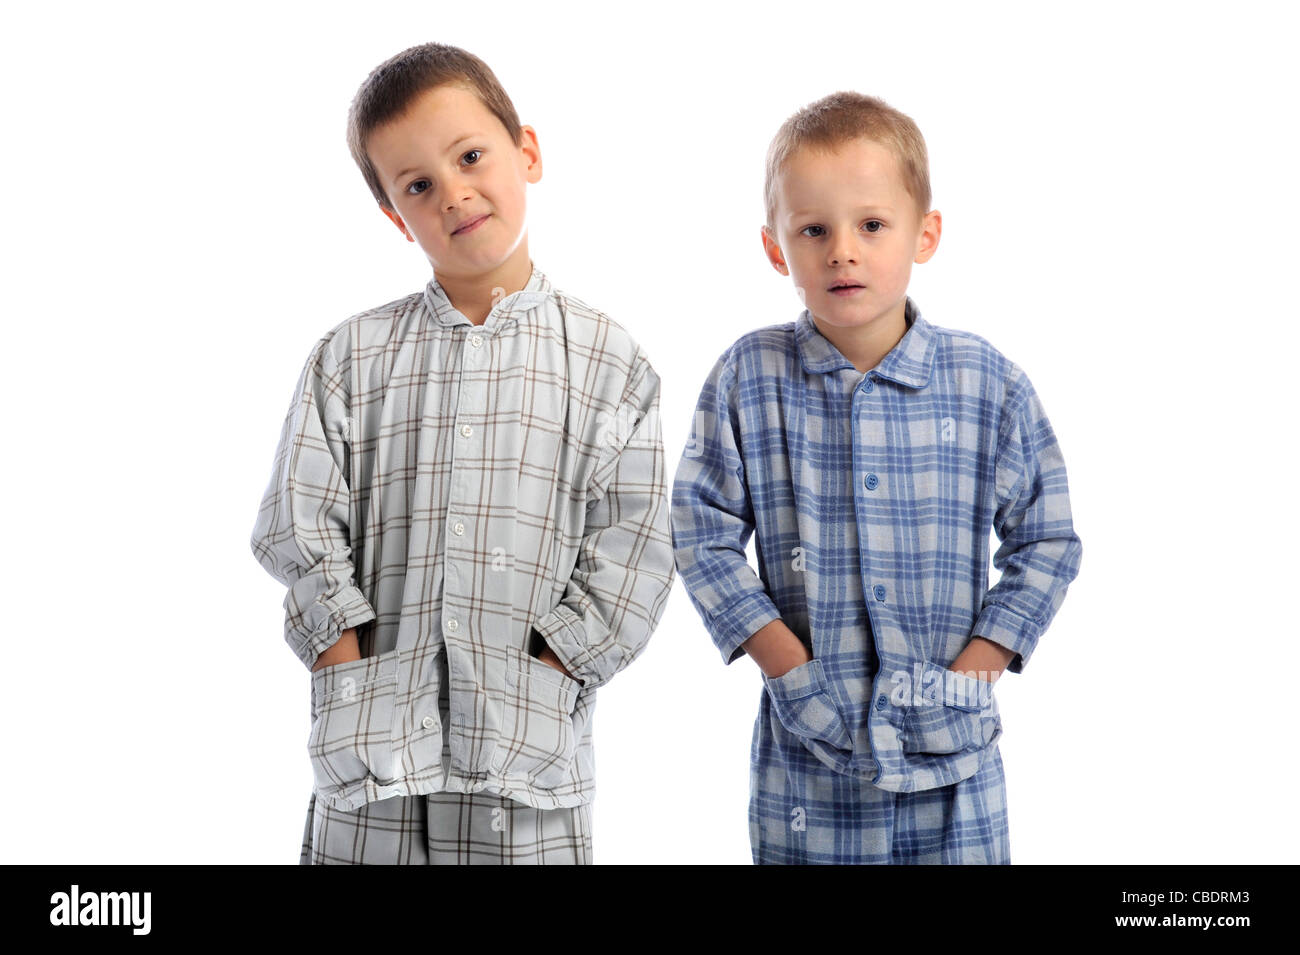 8ed7da61e6f4c Deux petits garçons en pyjama. isolatd sur fond blanc Banque D ...